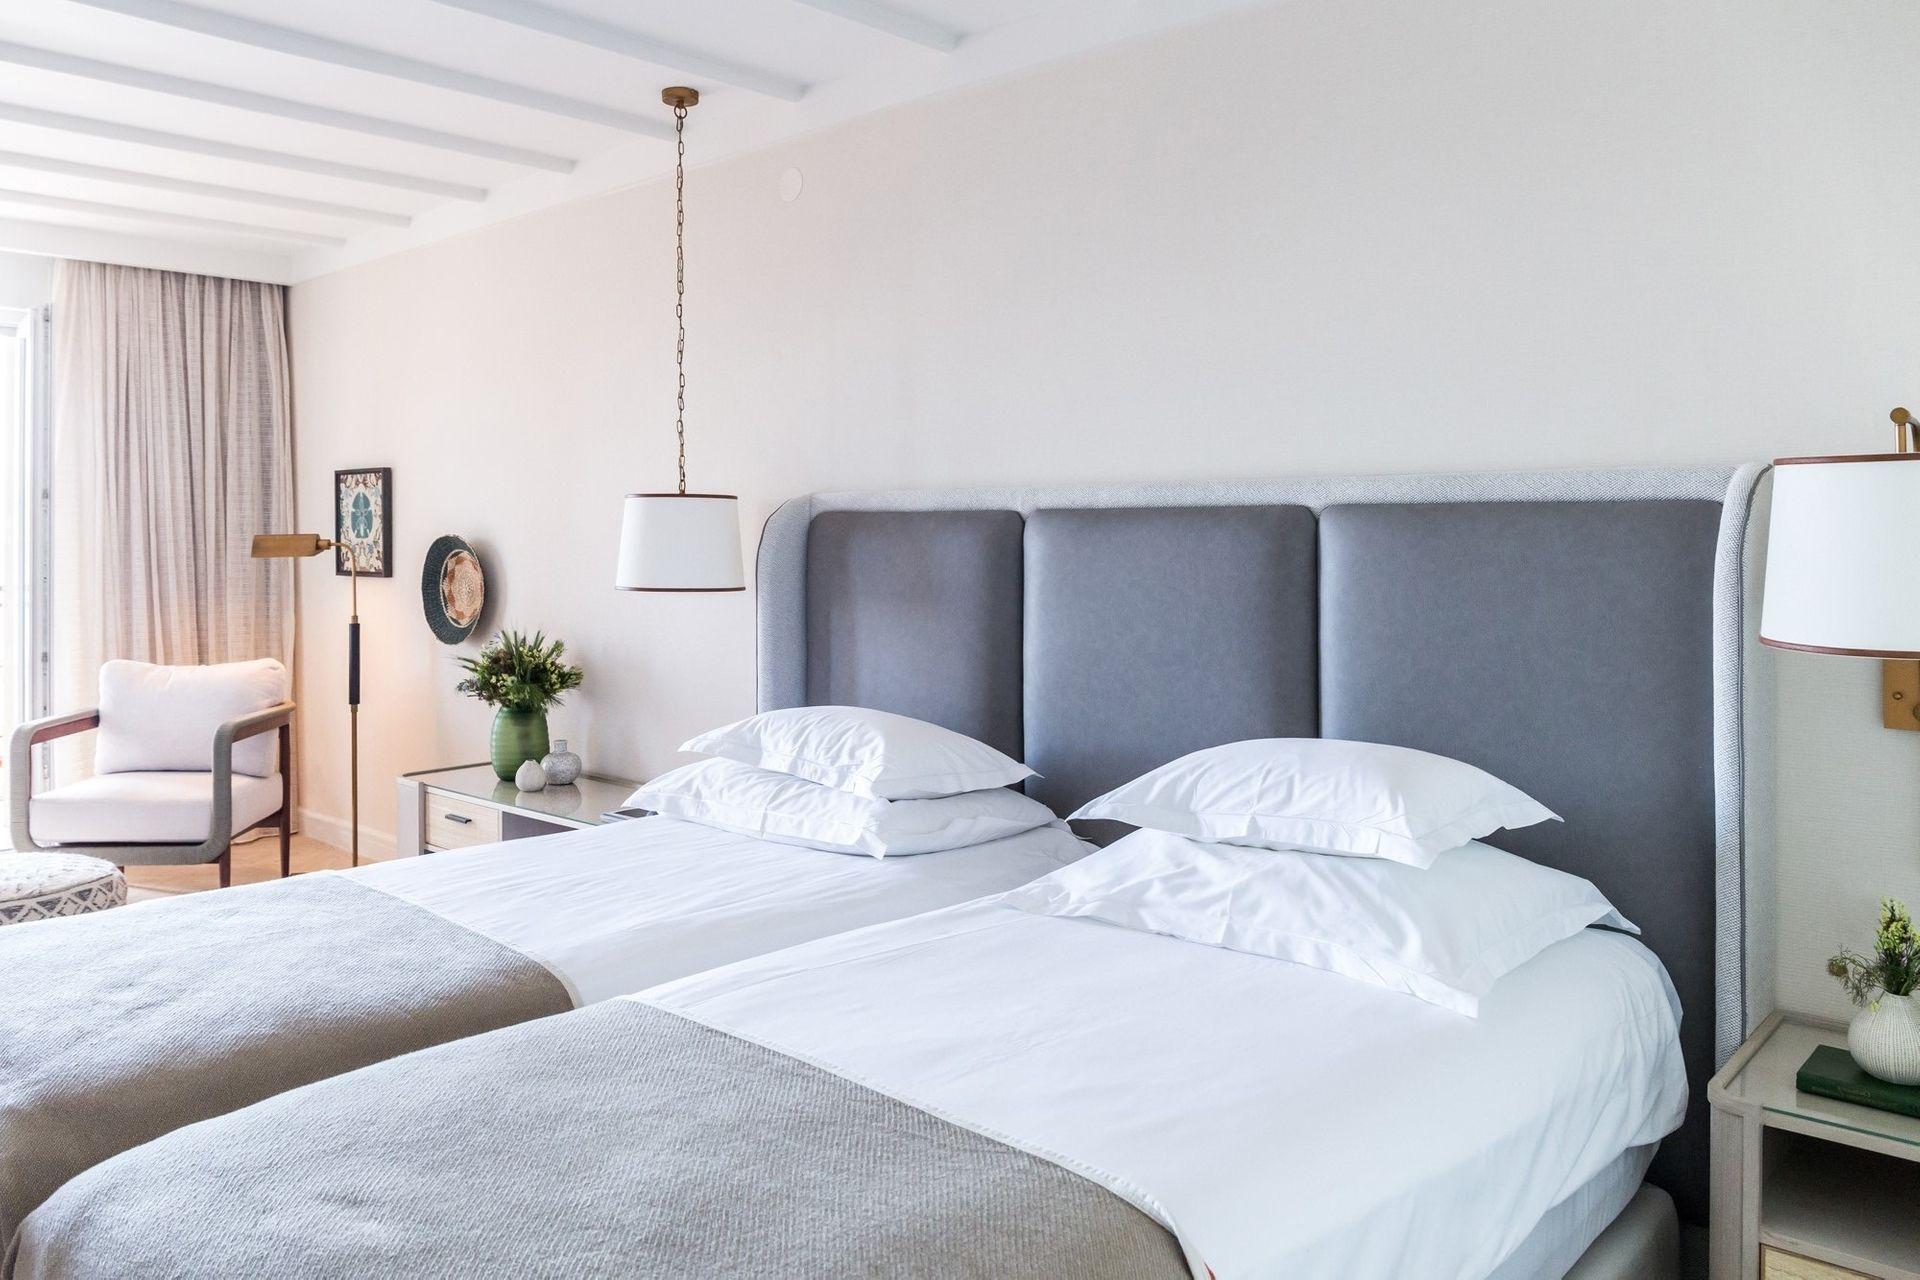 Superior Double/Twin Room Villa Camellia 28 m² Courtyard/Garden View and Balcony-4